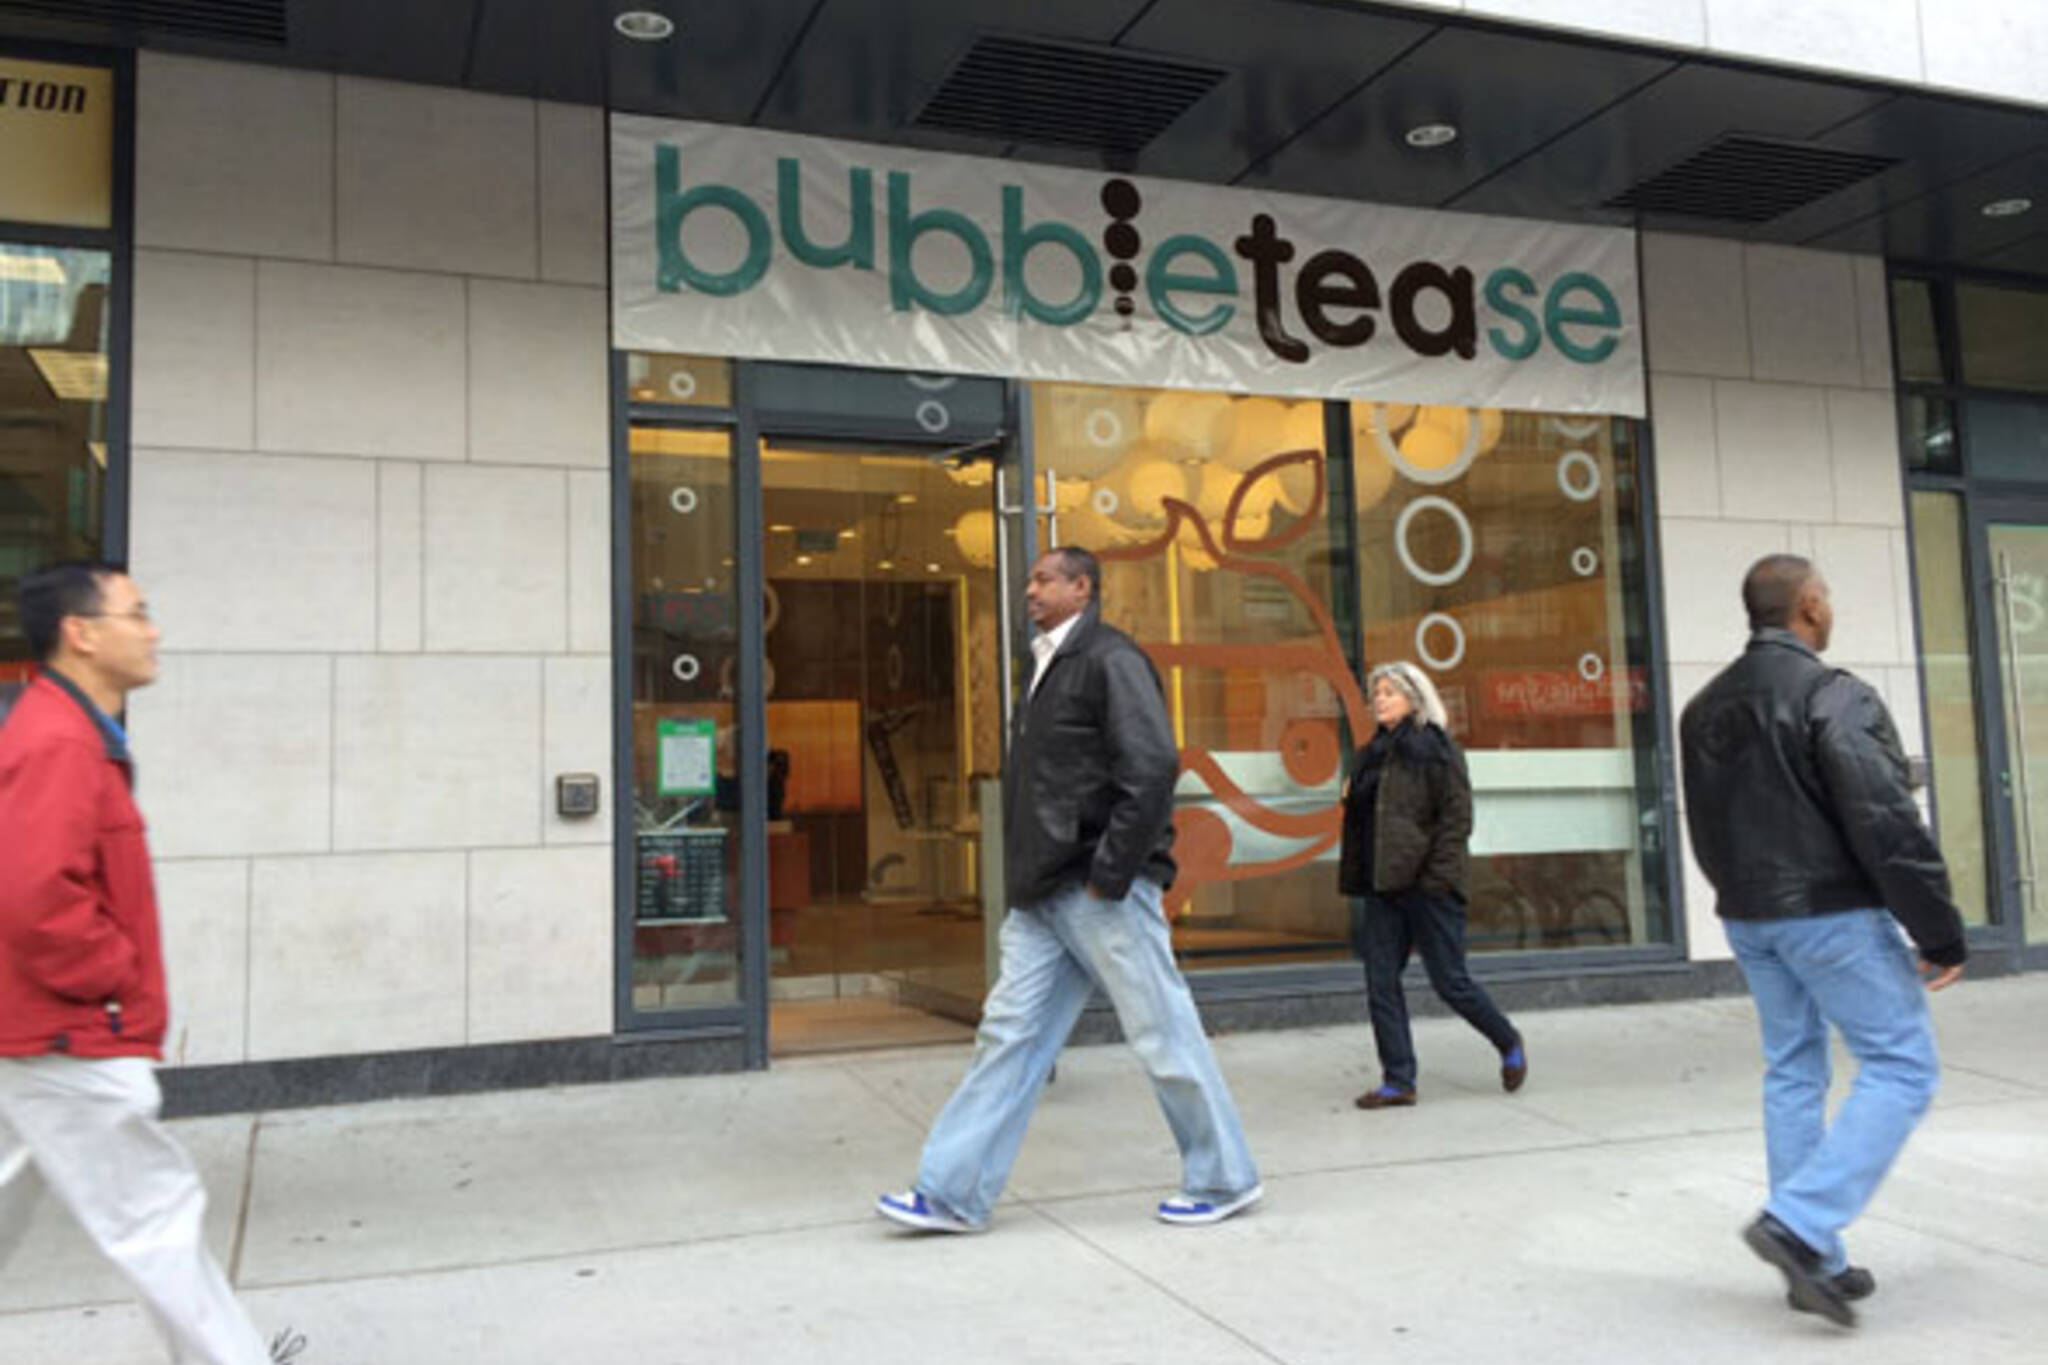 bubbletease dundas